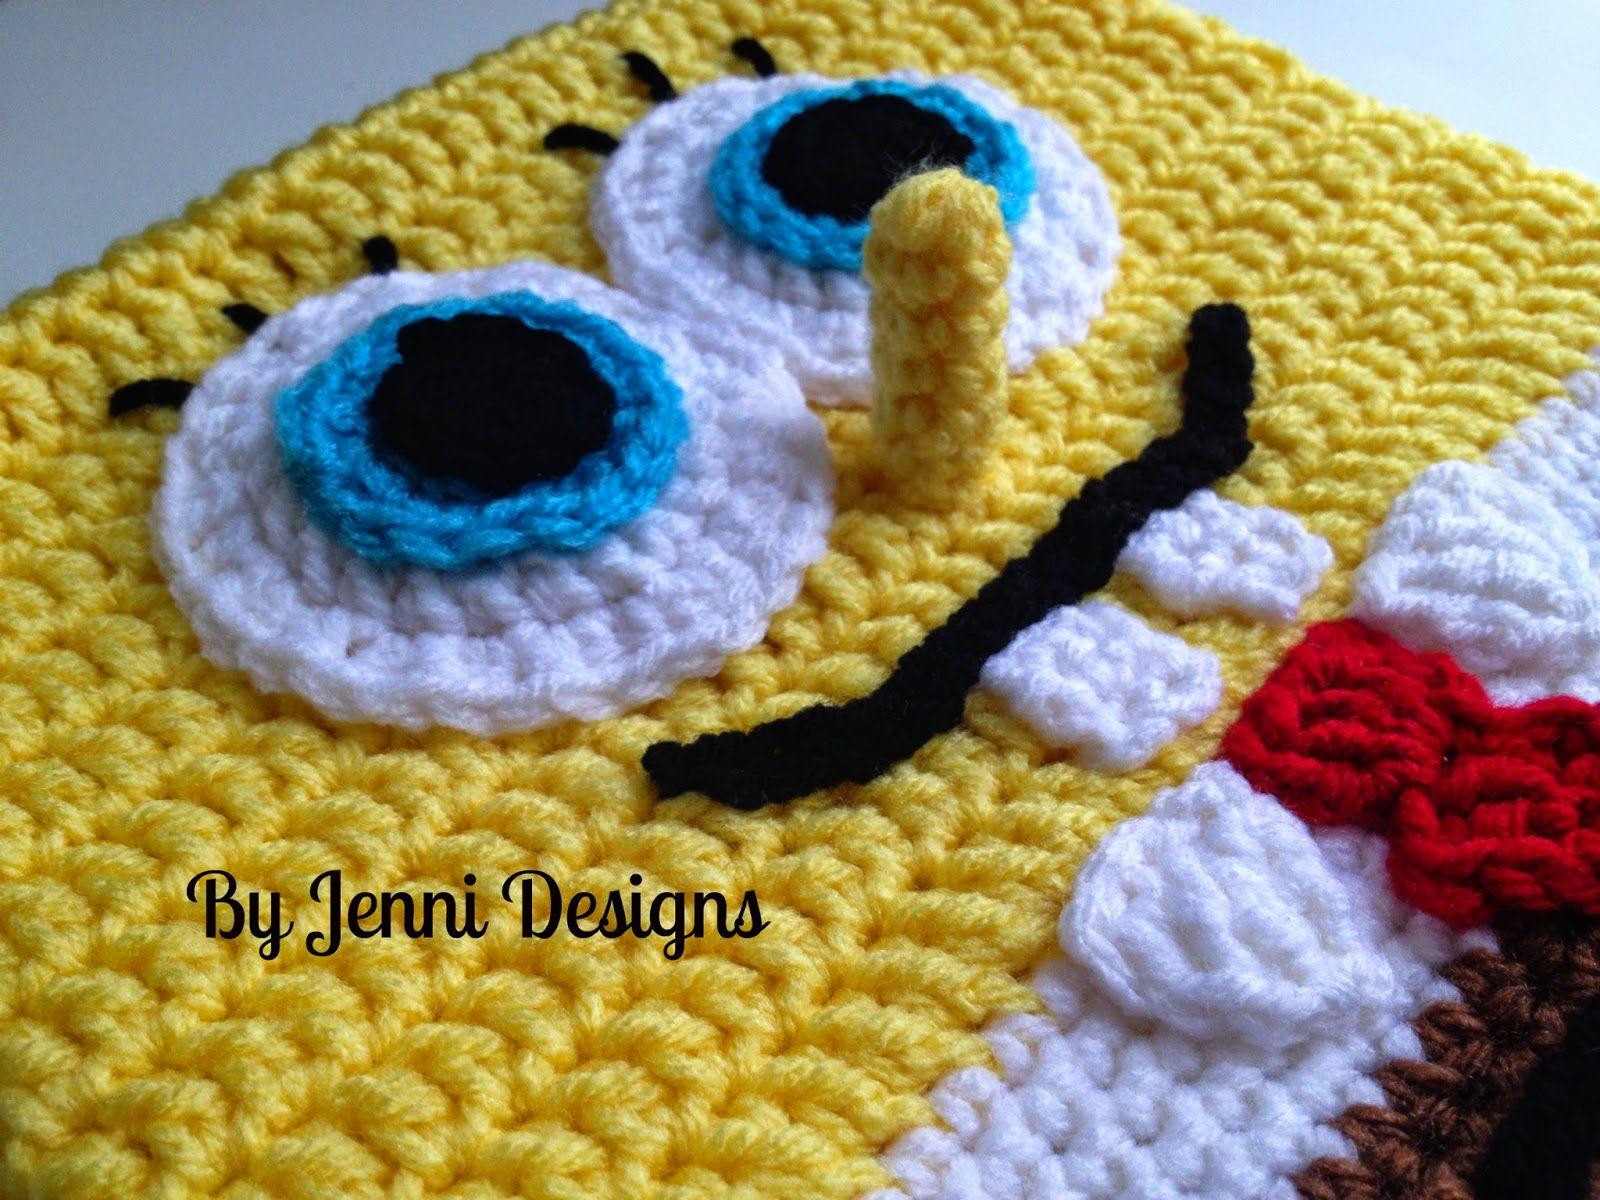 Free Crochet Pattern: Spongebob Squarepants Inspired Hat | Crochet ...